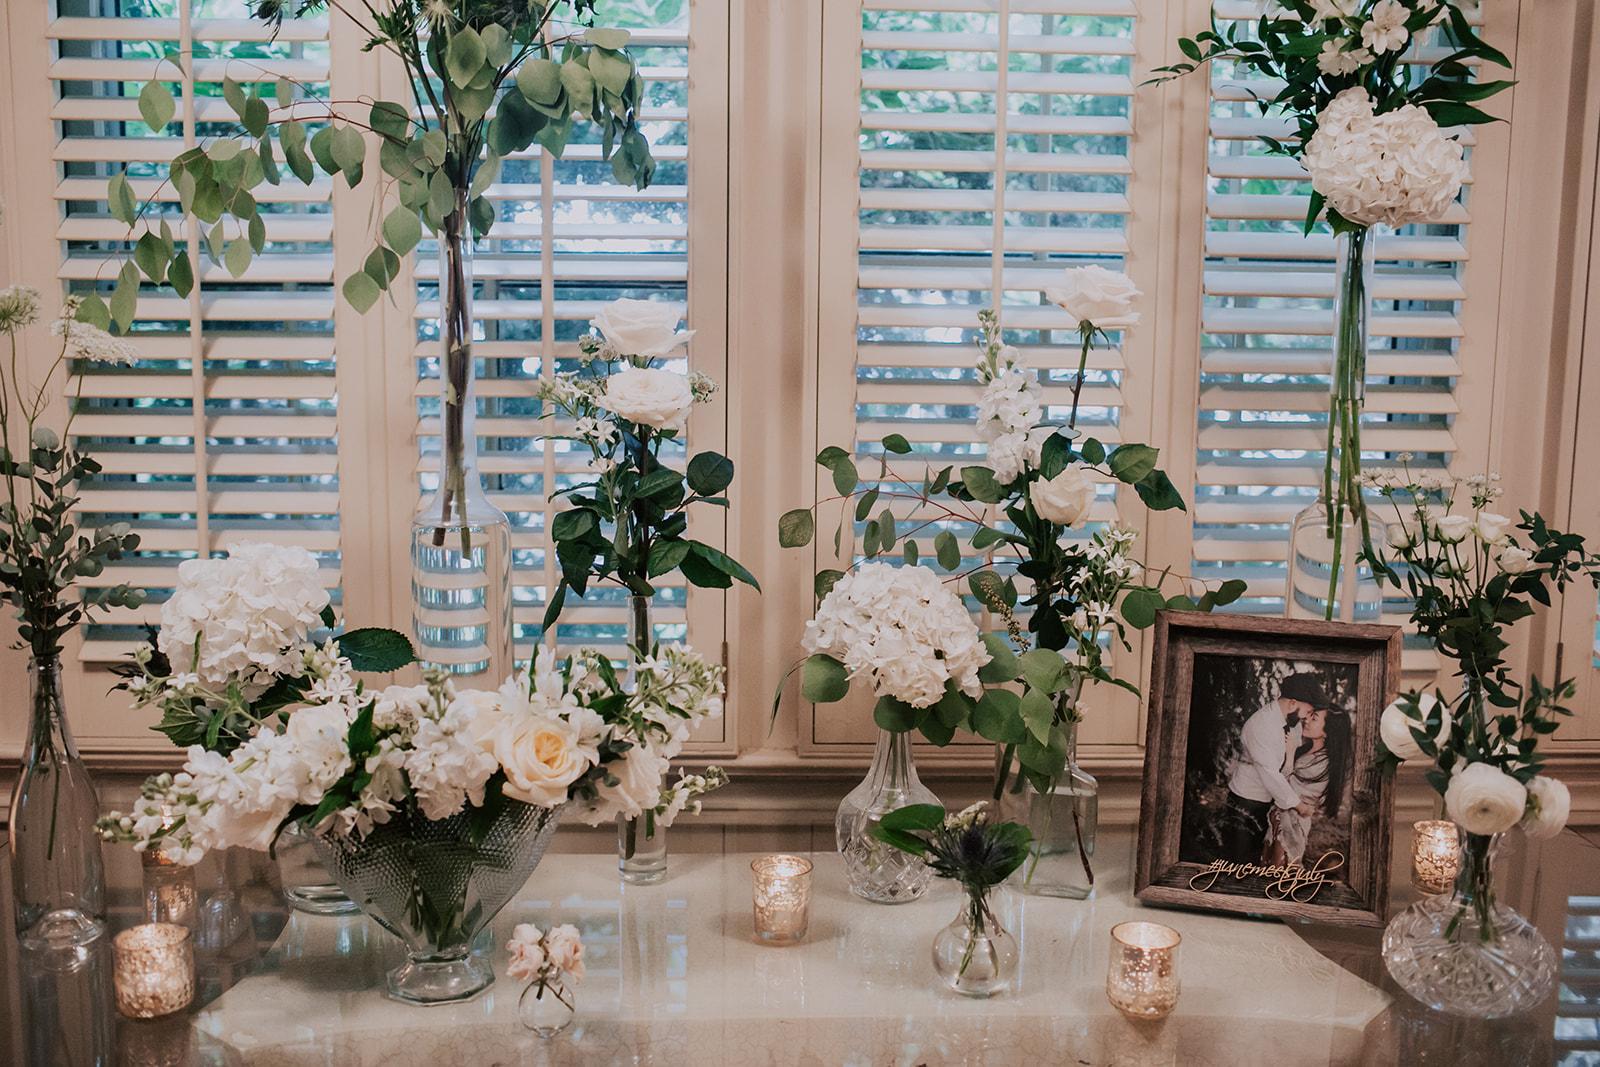 Wedding table decor: Summer Soiree at Cedarwood Weddings featured on Nashville Bride Guide